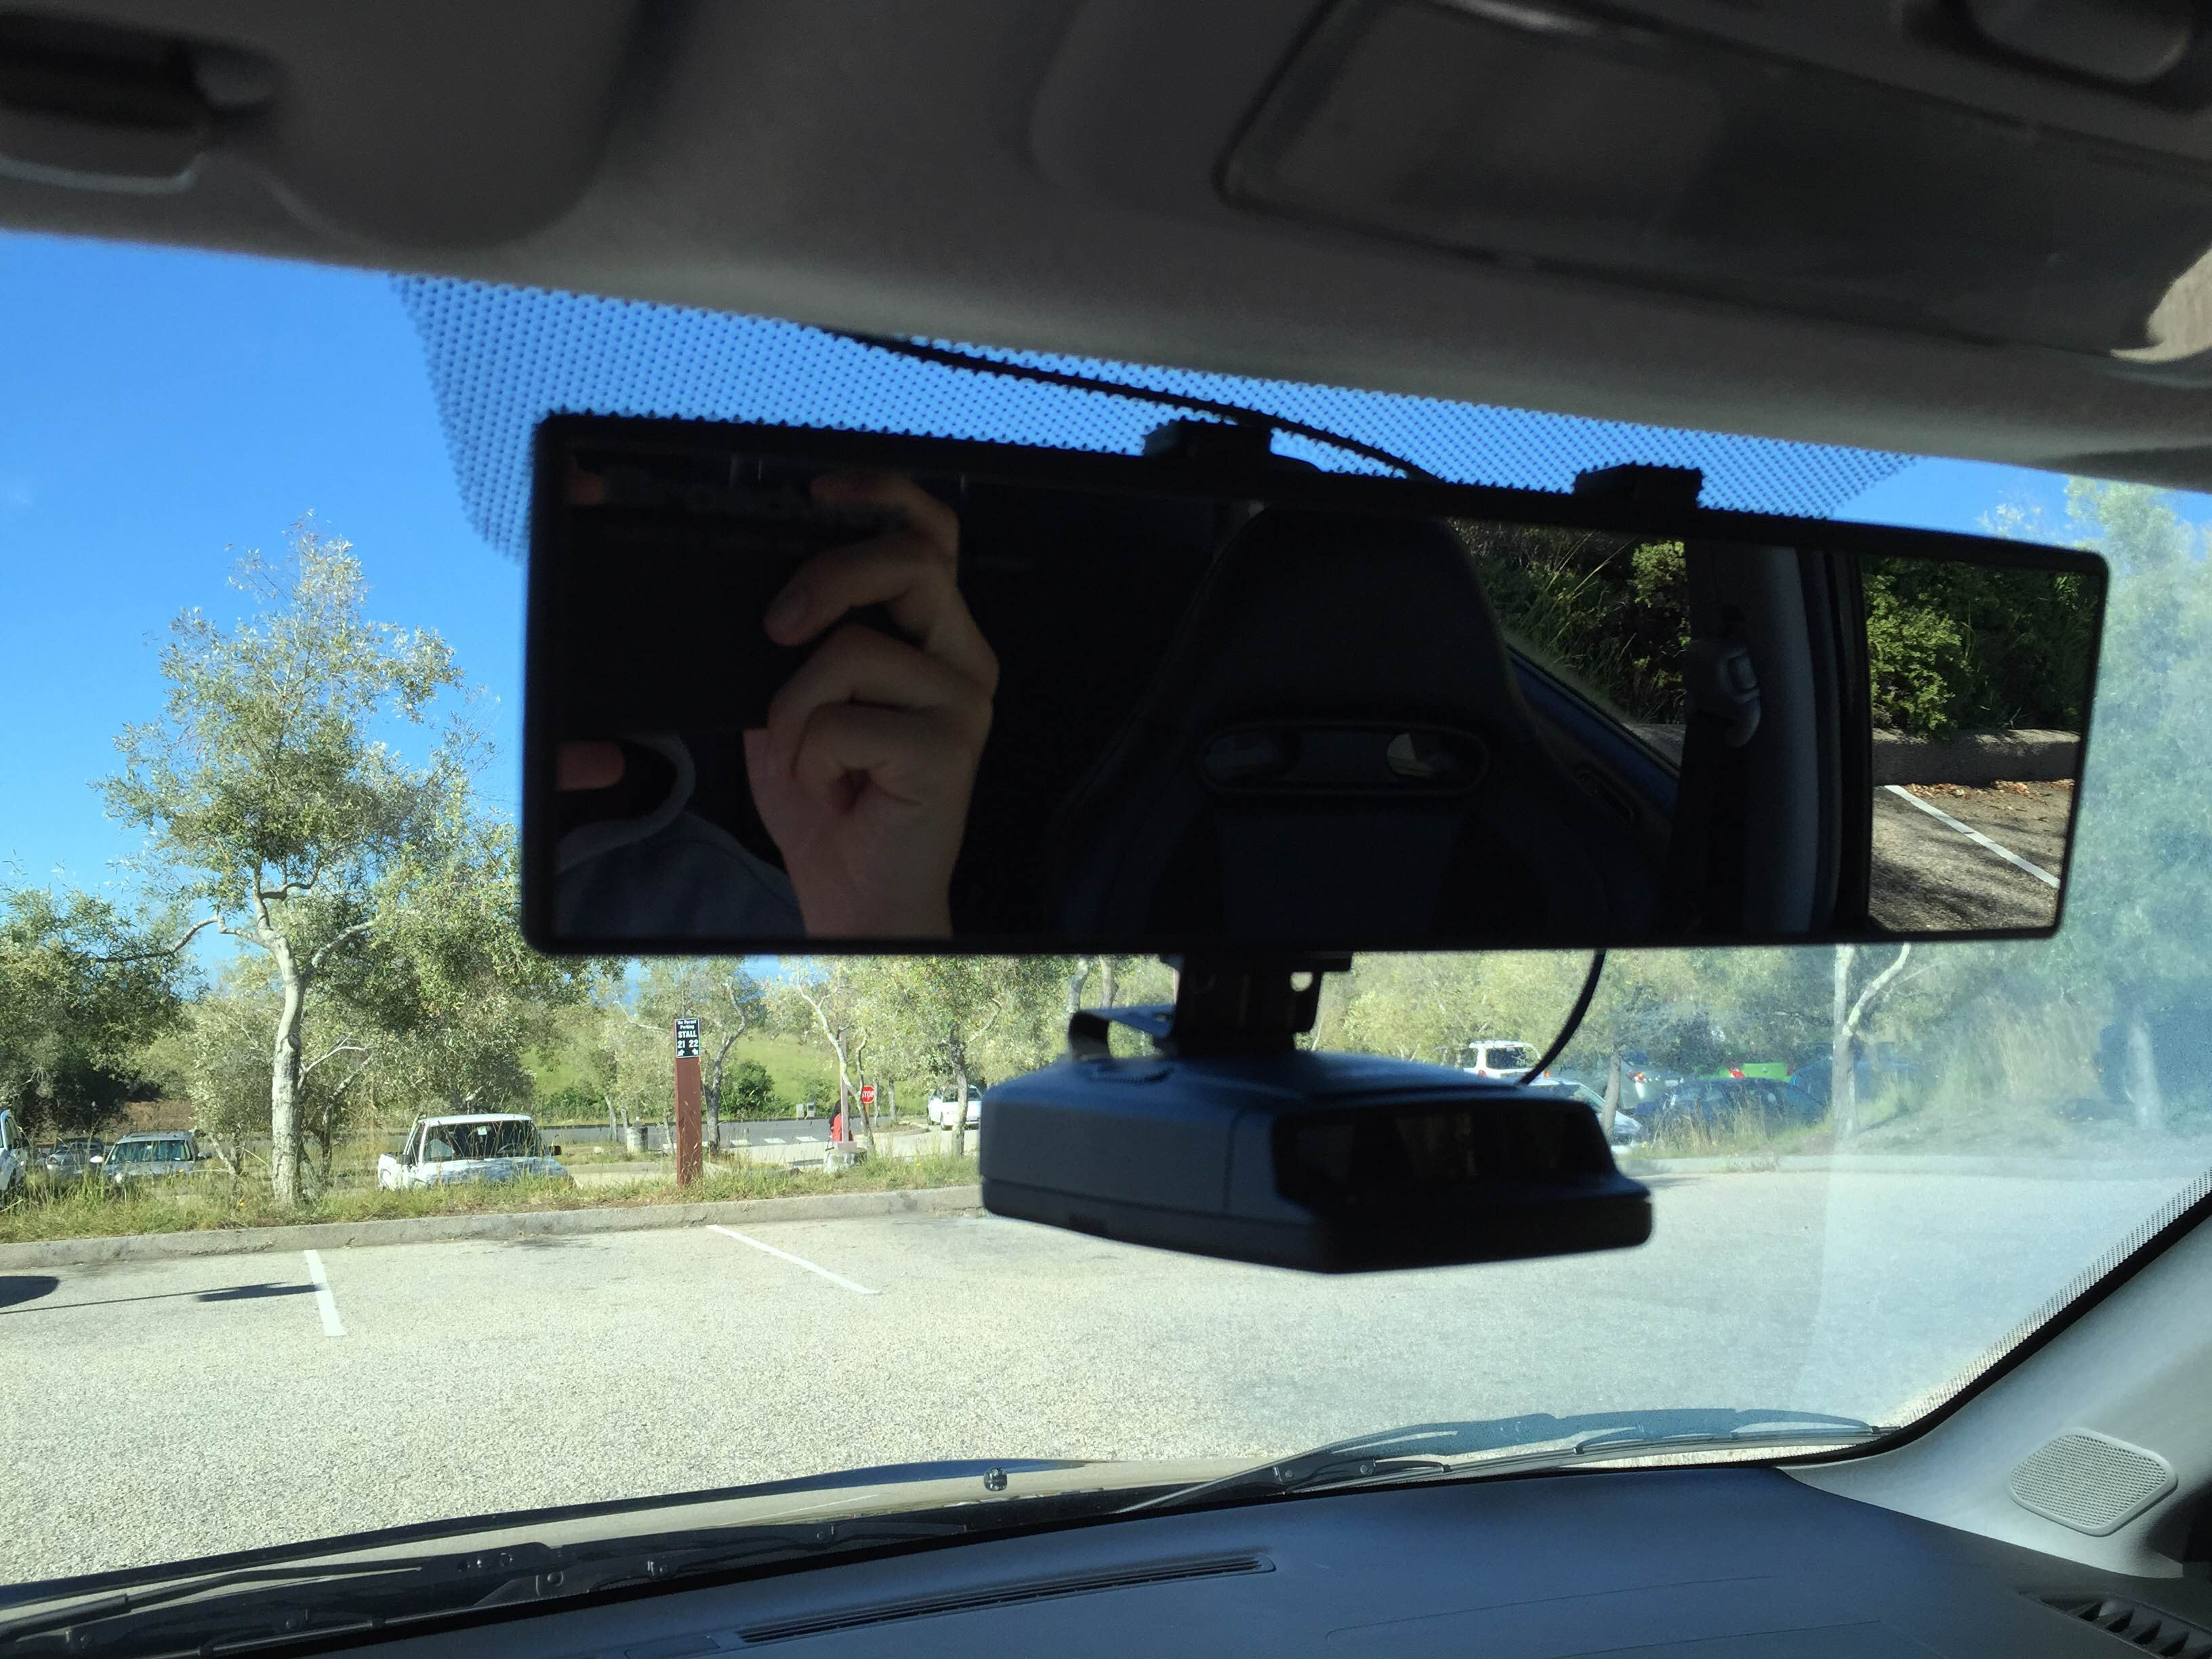 HOW TO Hardwire Radar Detector Mirror Mount – Evo 8 Panel Interior Fuse Box Location